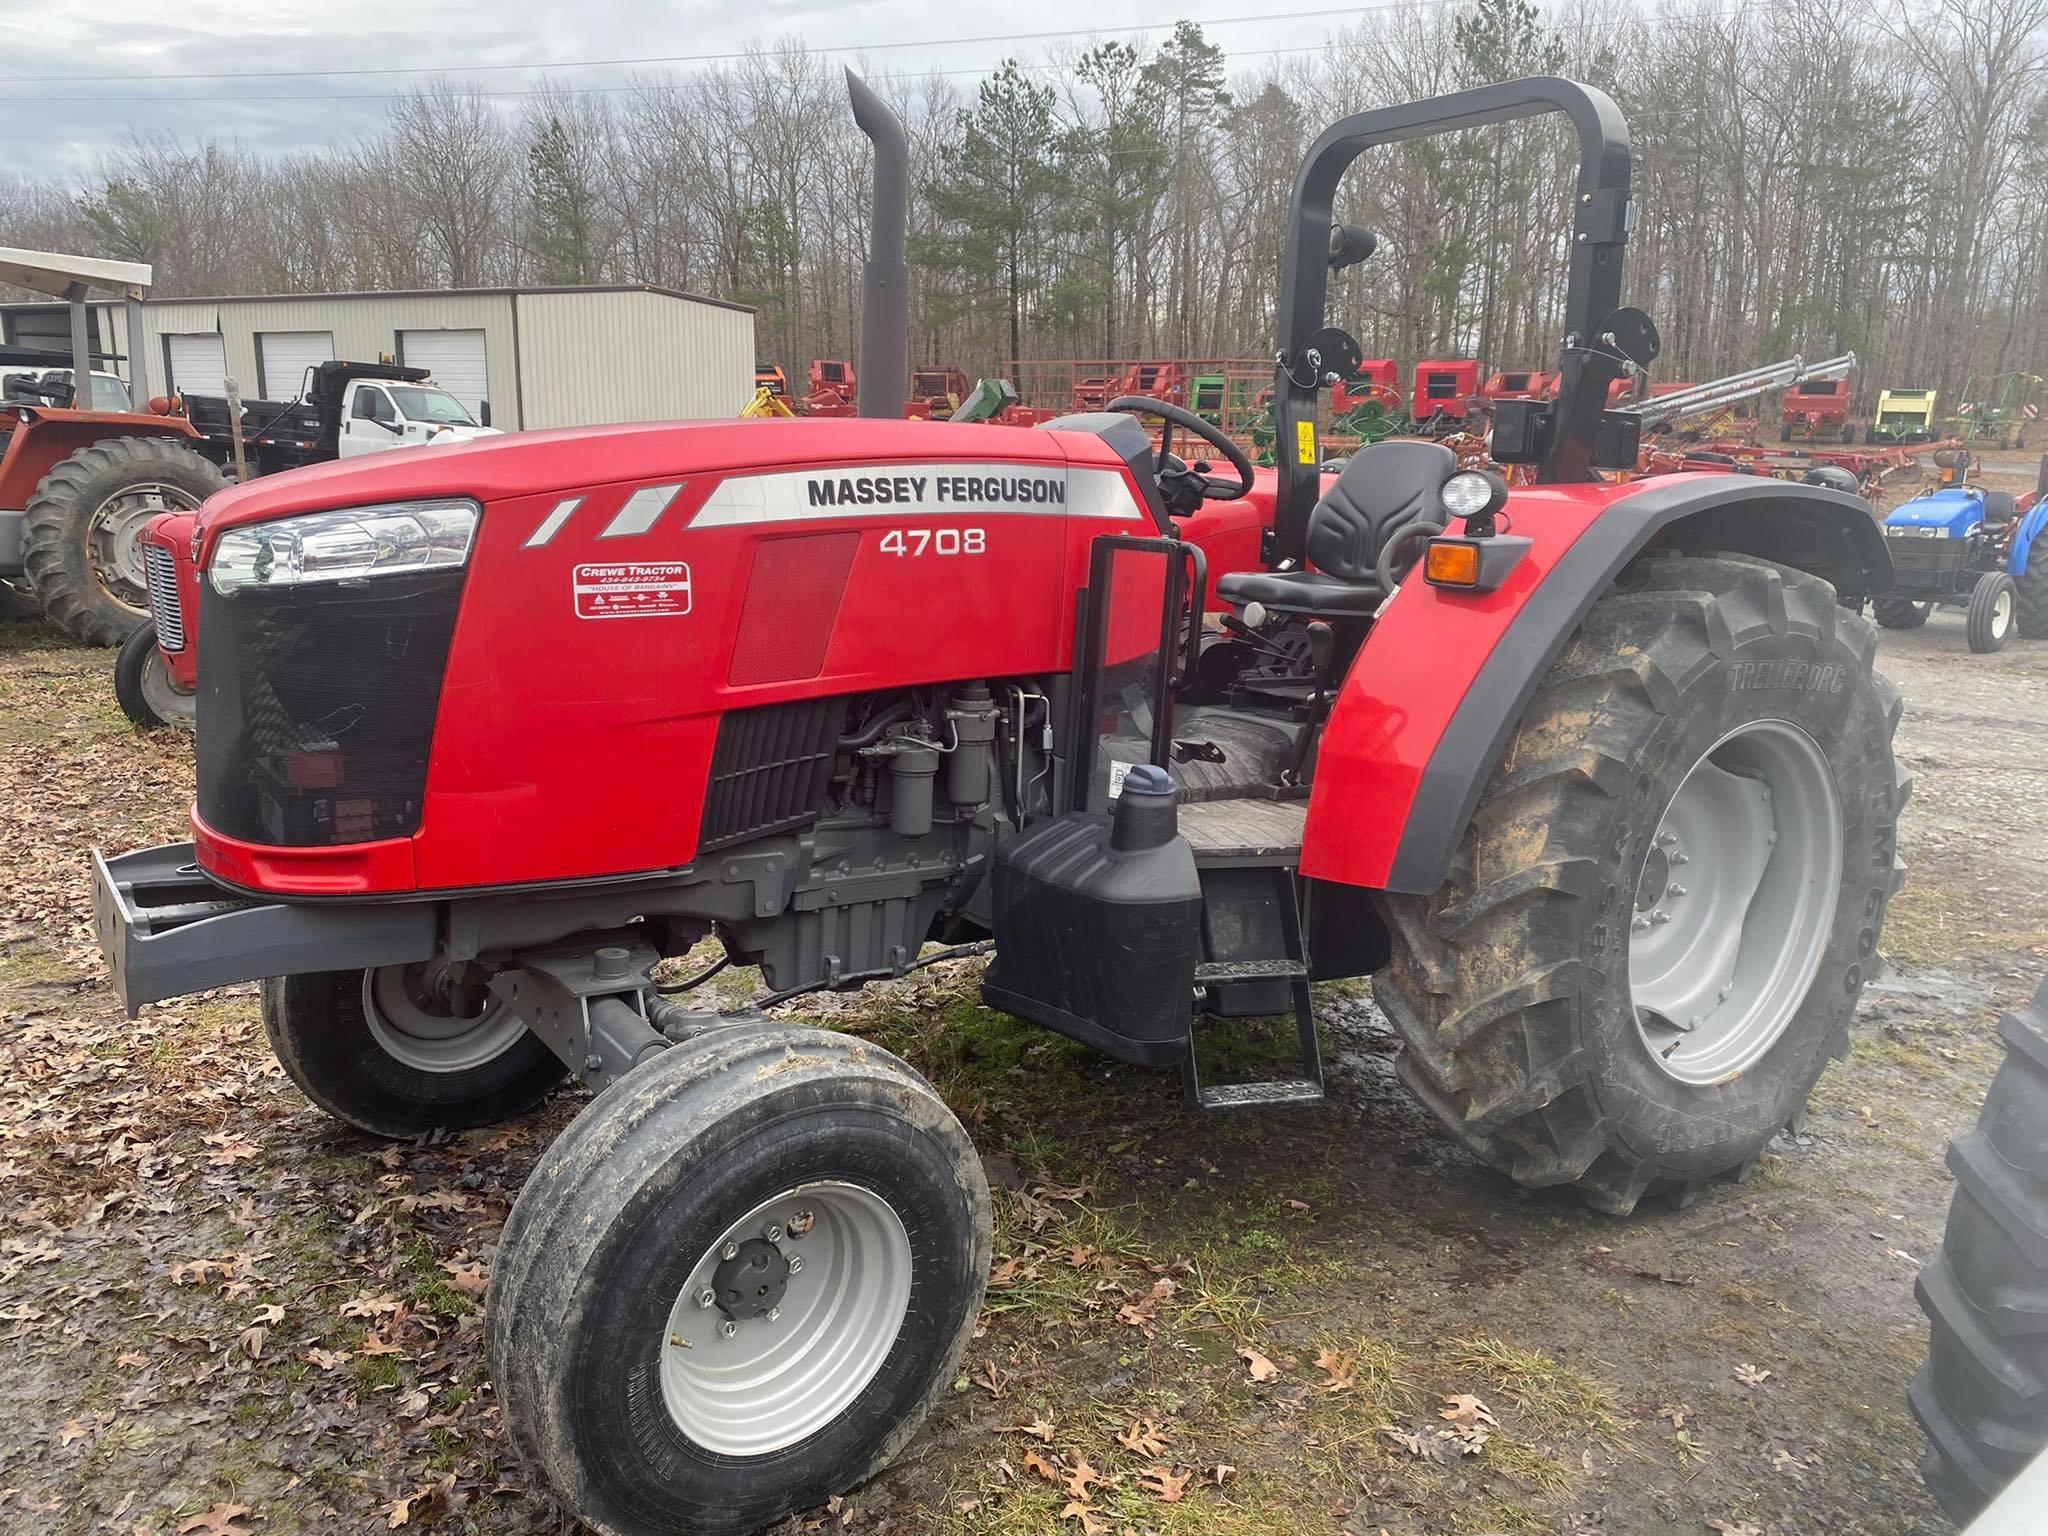 Used, 2020, Massey Ferguson, 4708, Tractors